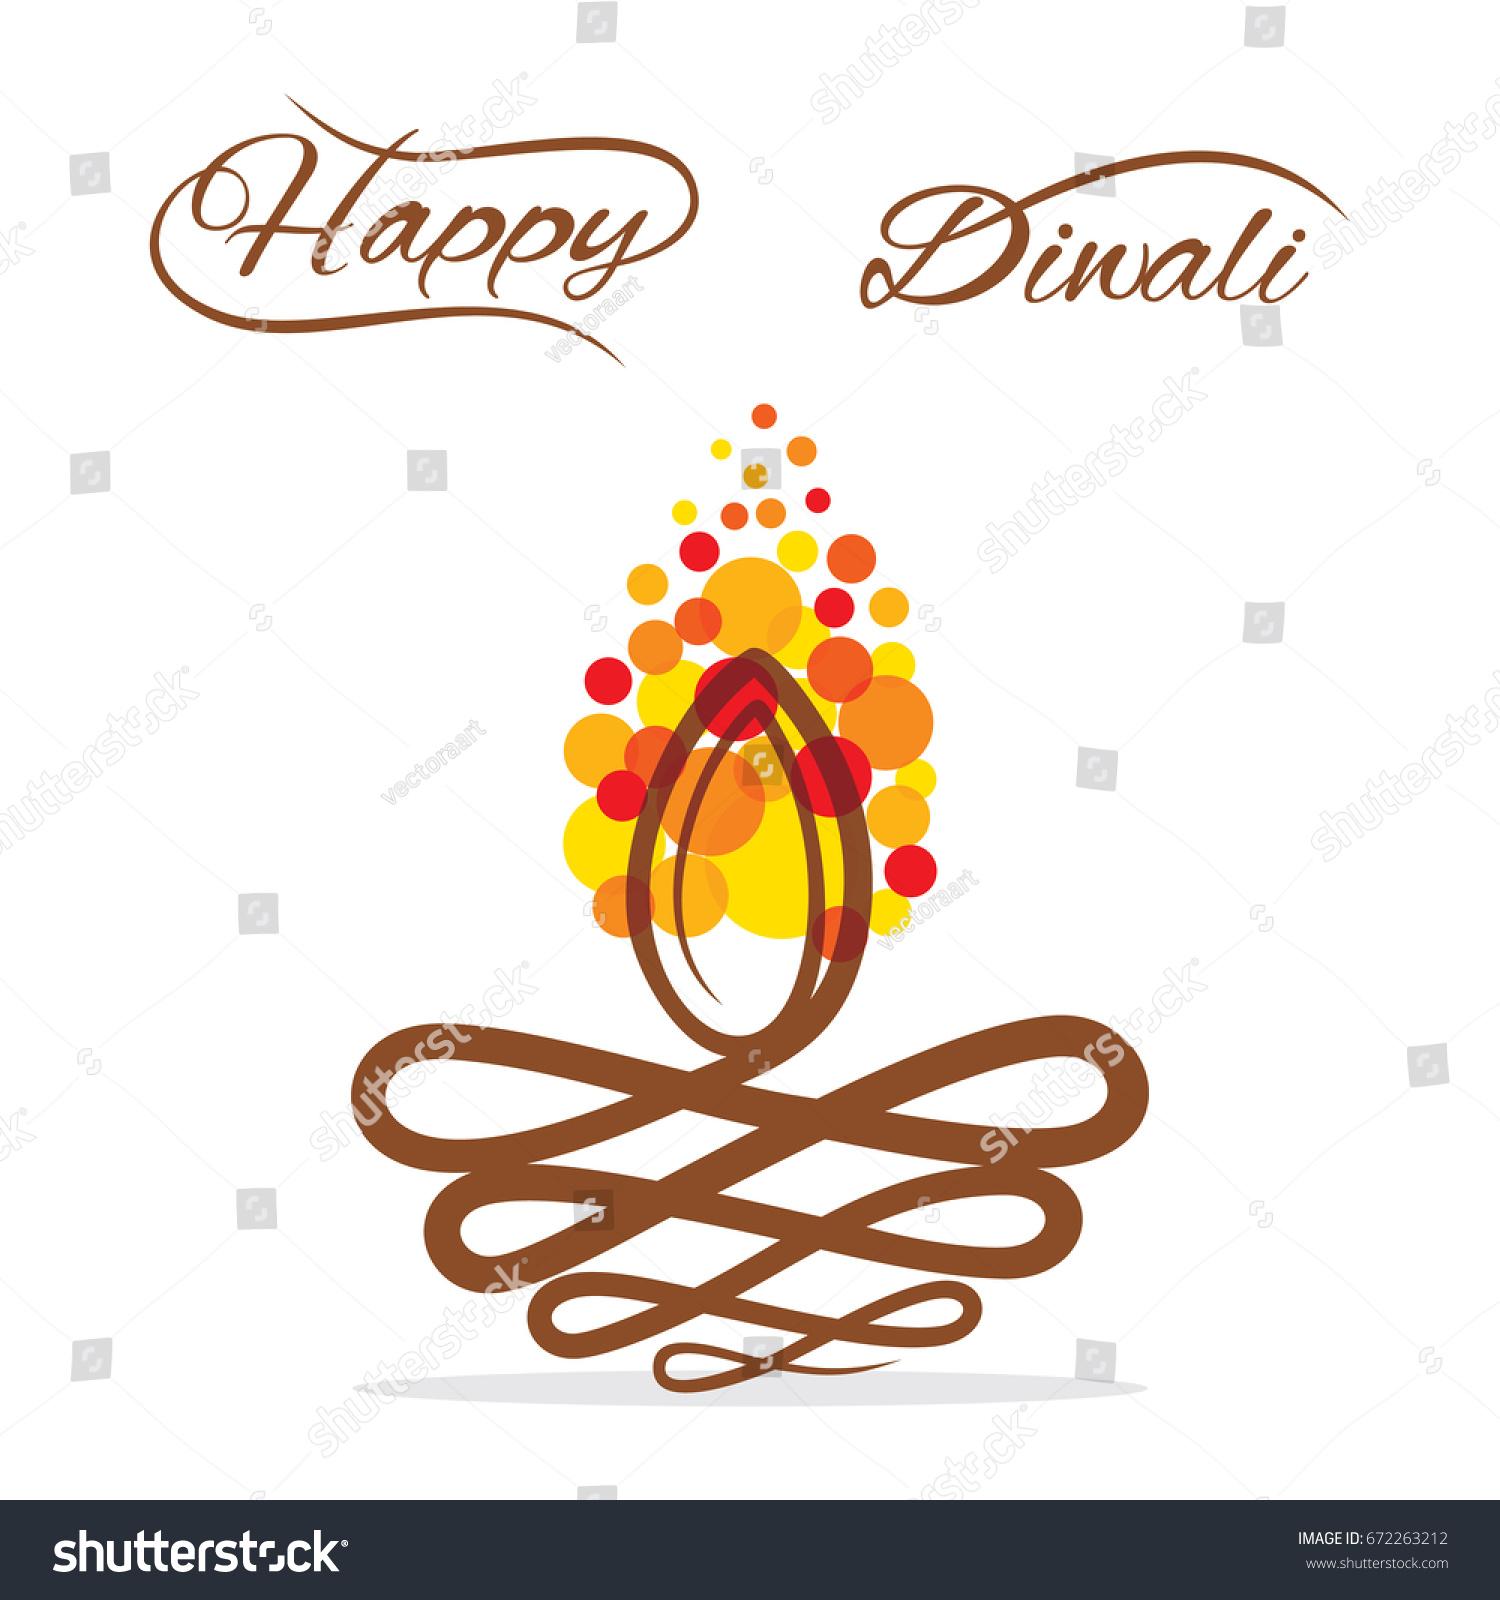 Abstract Shape Diwali Diya Design Happy Stock Vector 2018